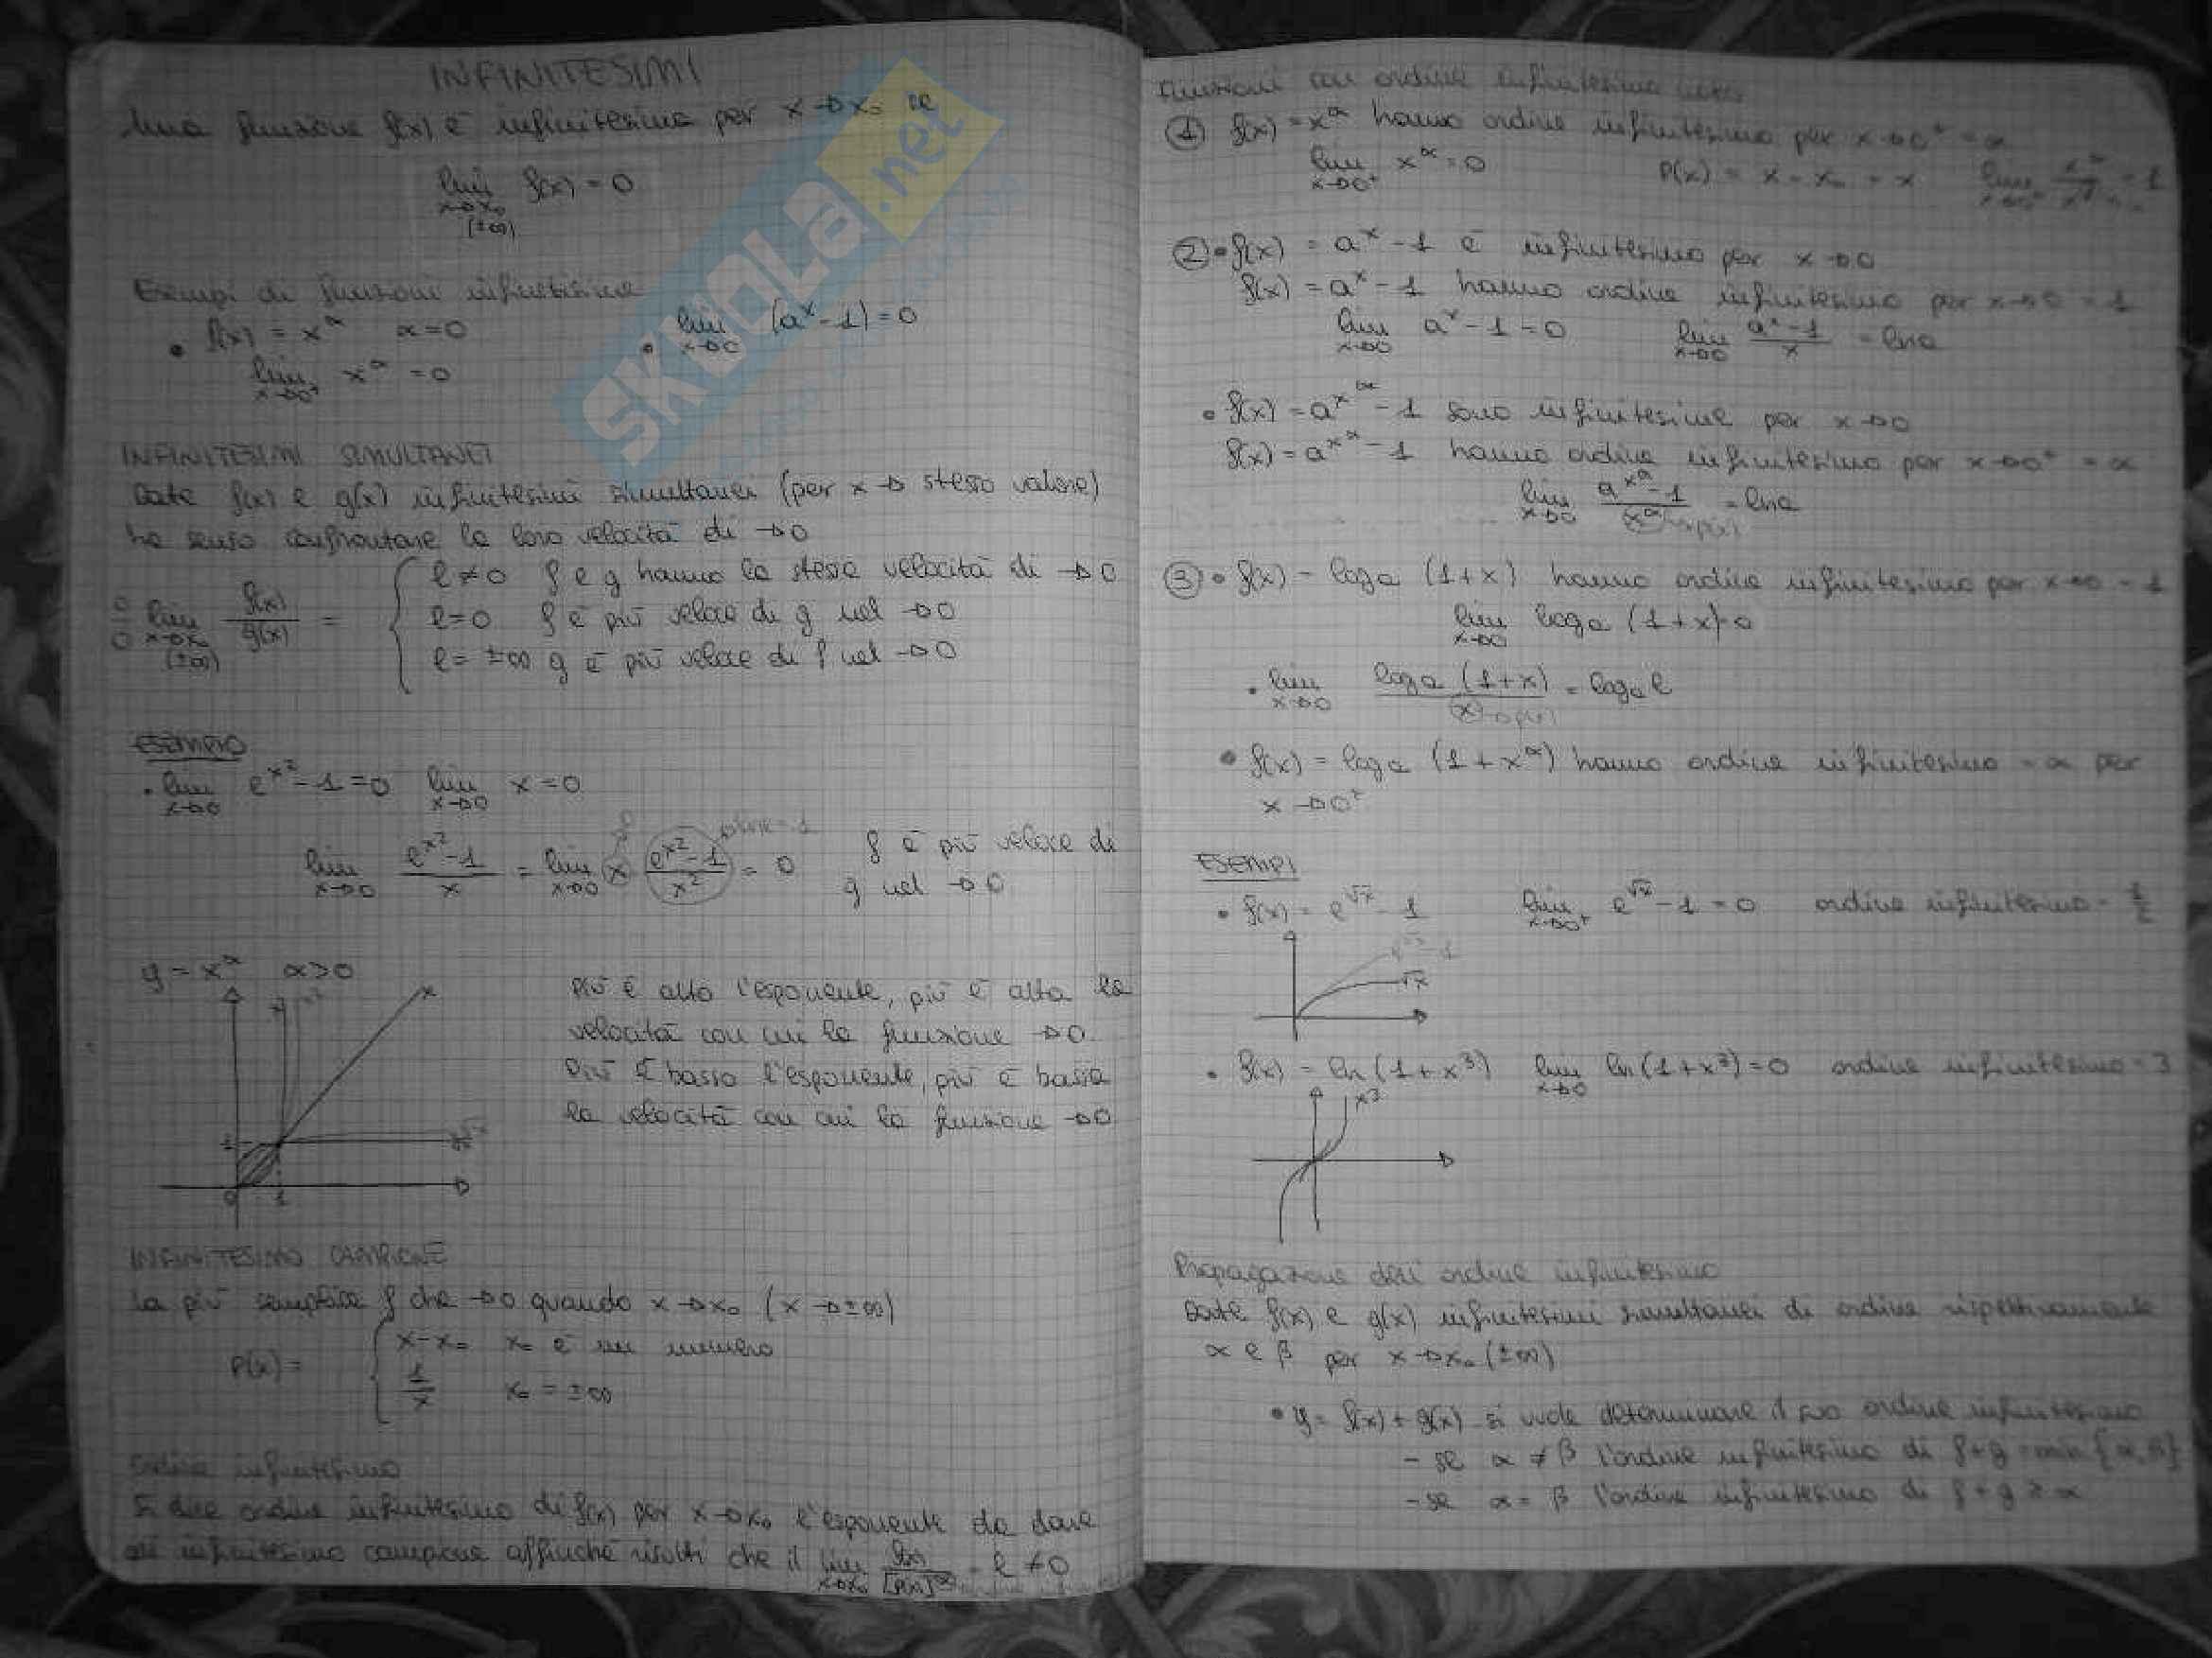 Matematica generale - parte 3